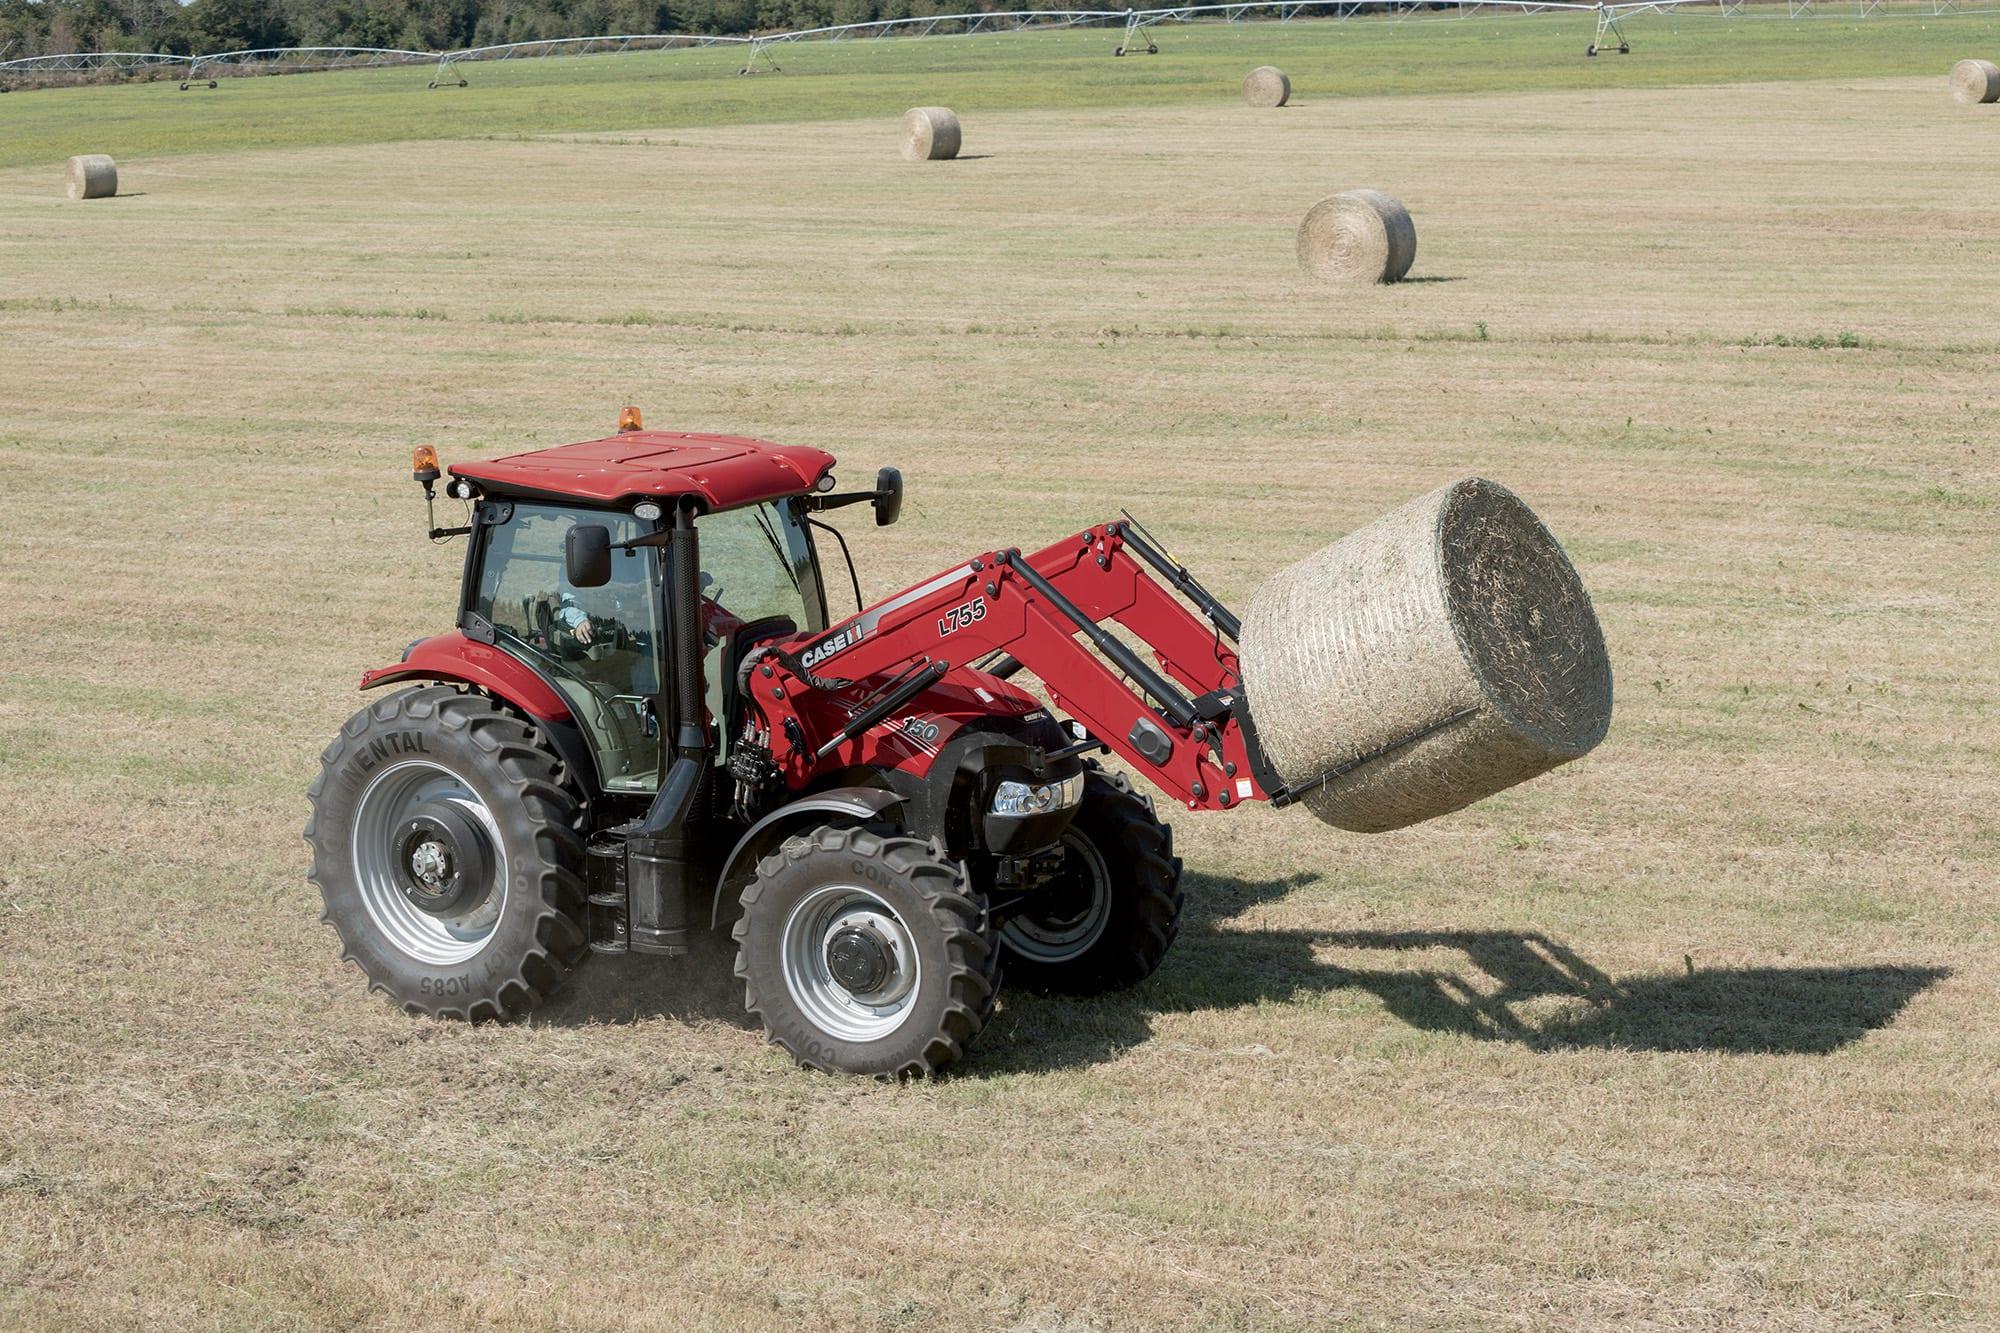 maxxum 150 4 wheel drive multipurpose tractors case ih rh caseih com Case IH Combine Case IH Pulling Tractors